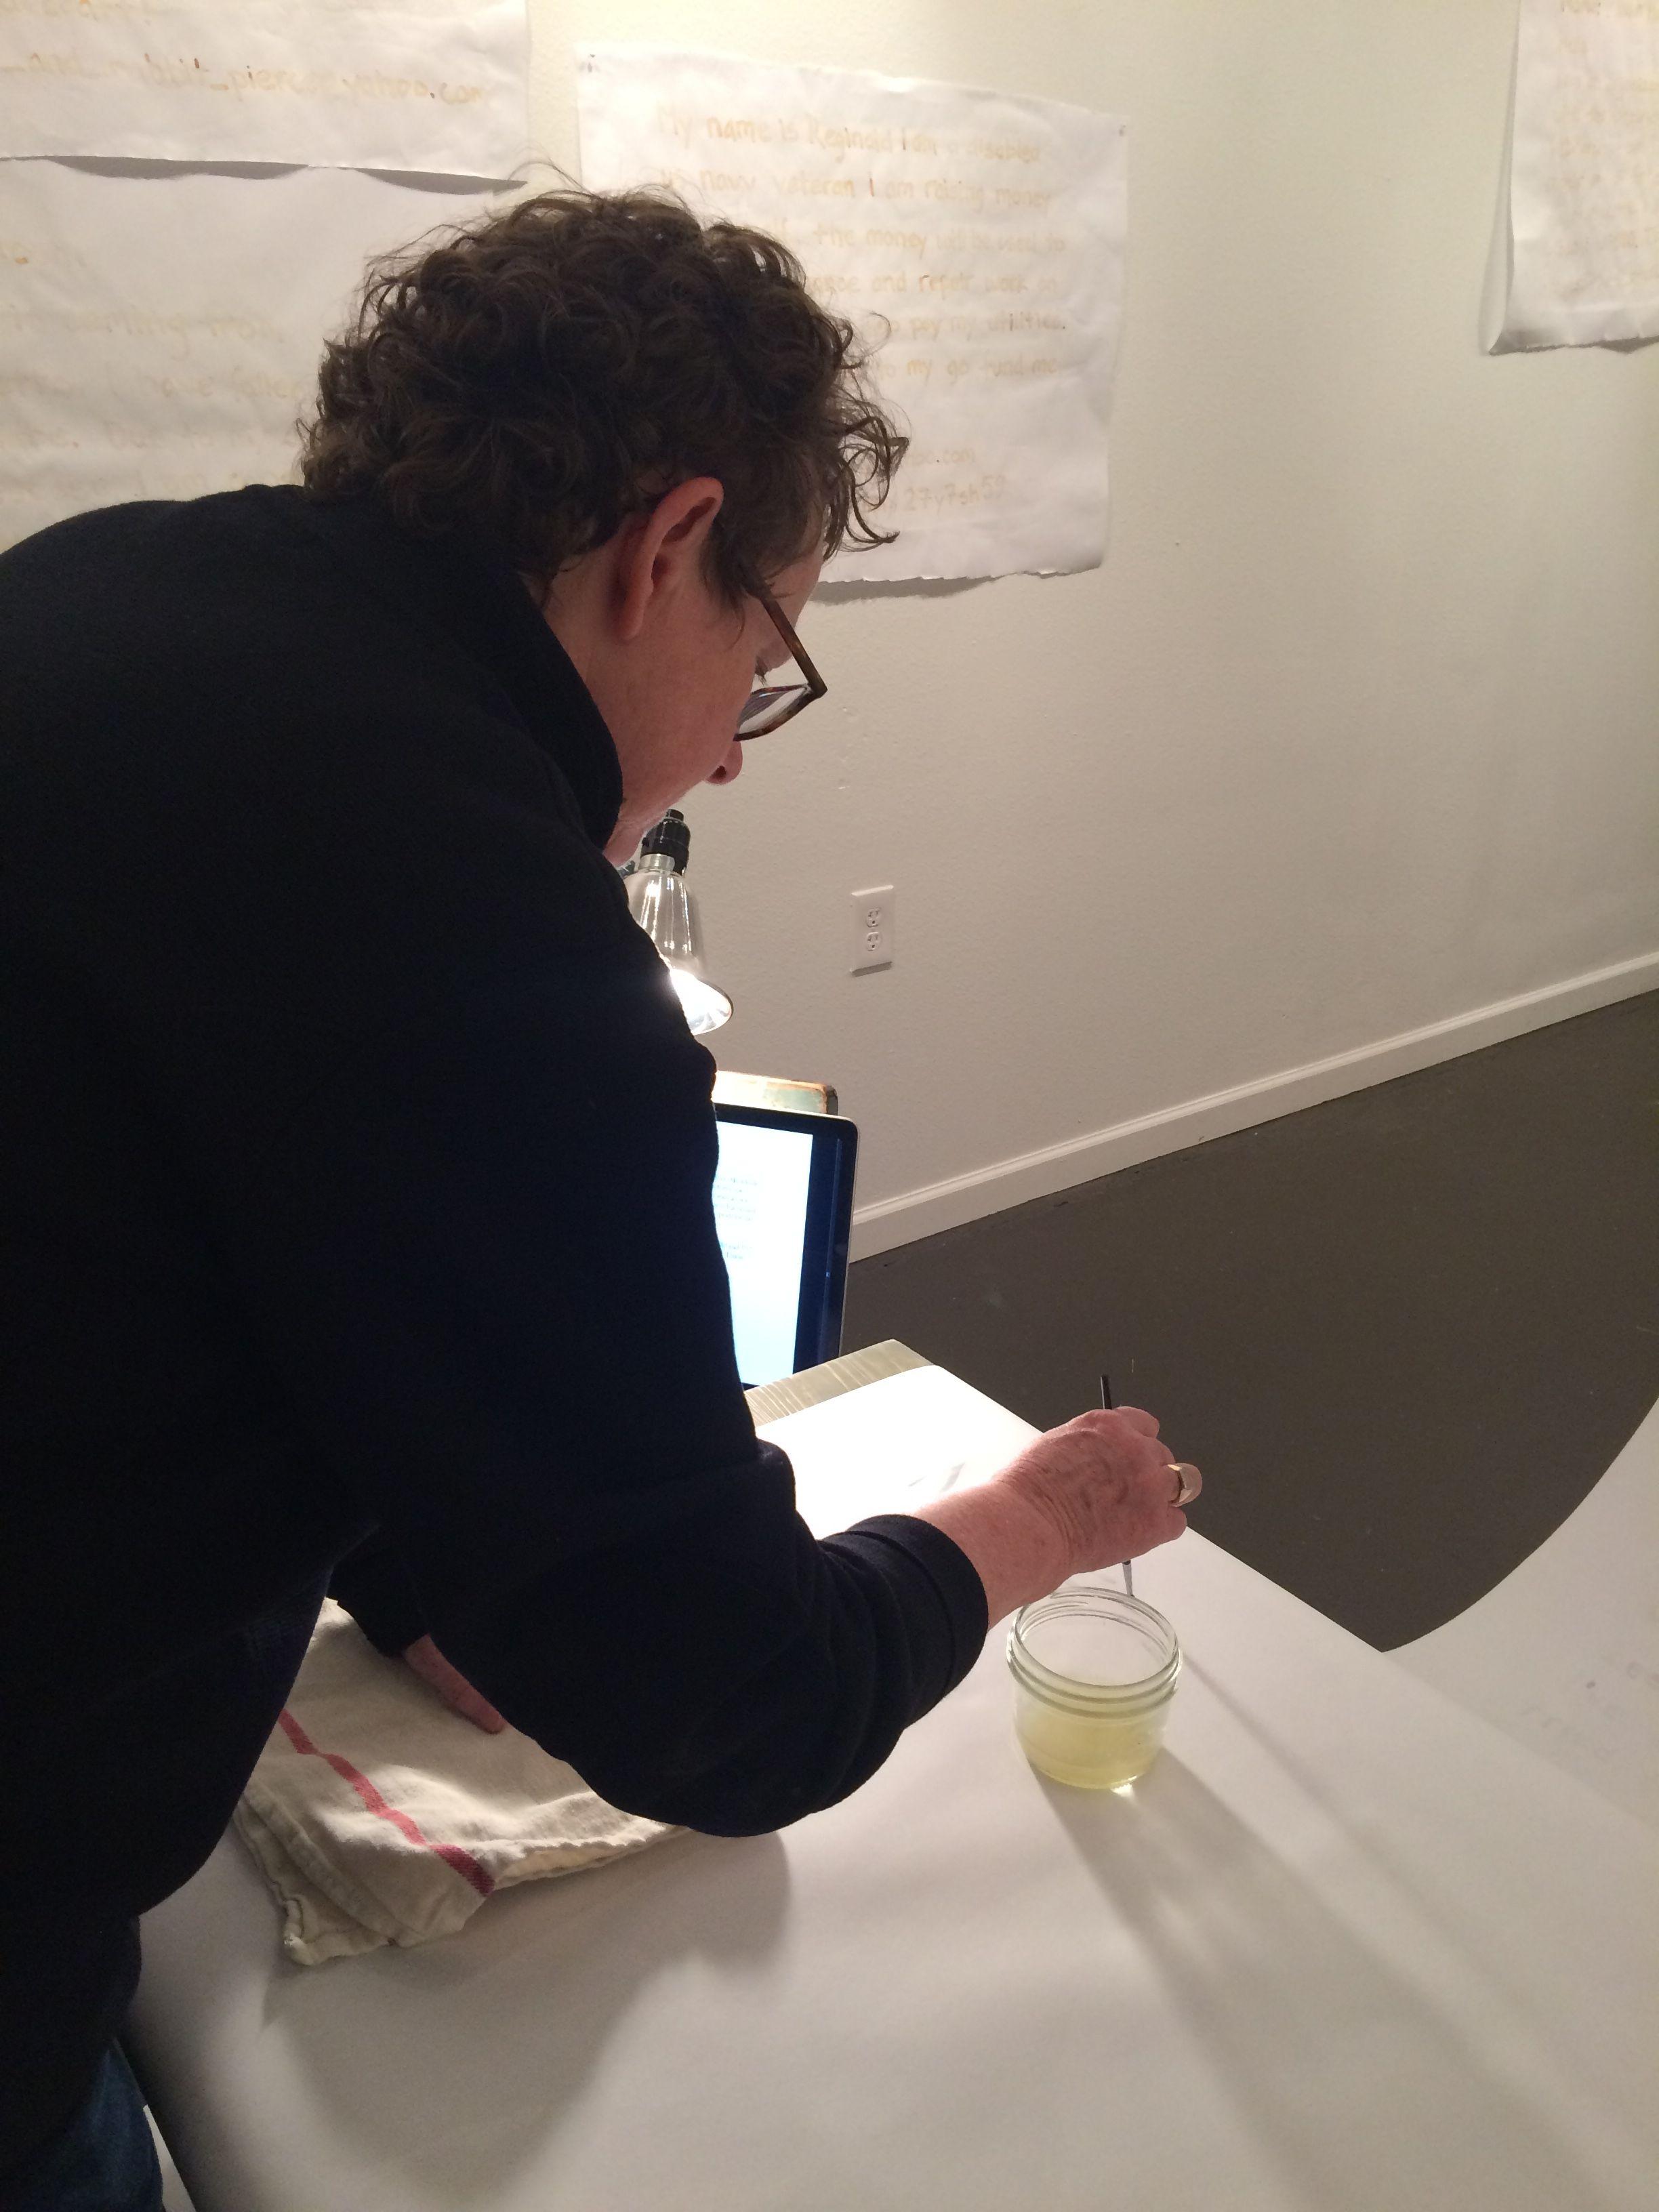 Installation reception - participant writing